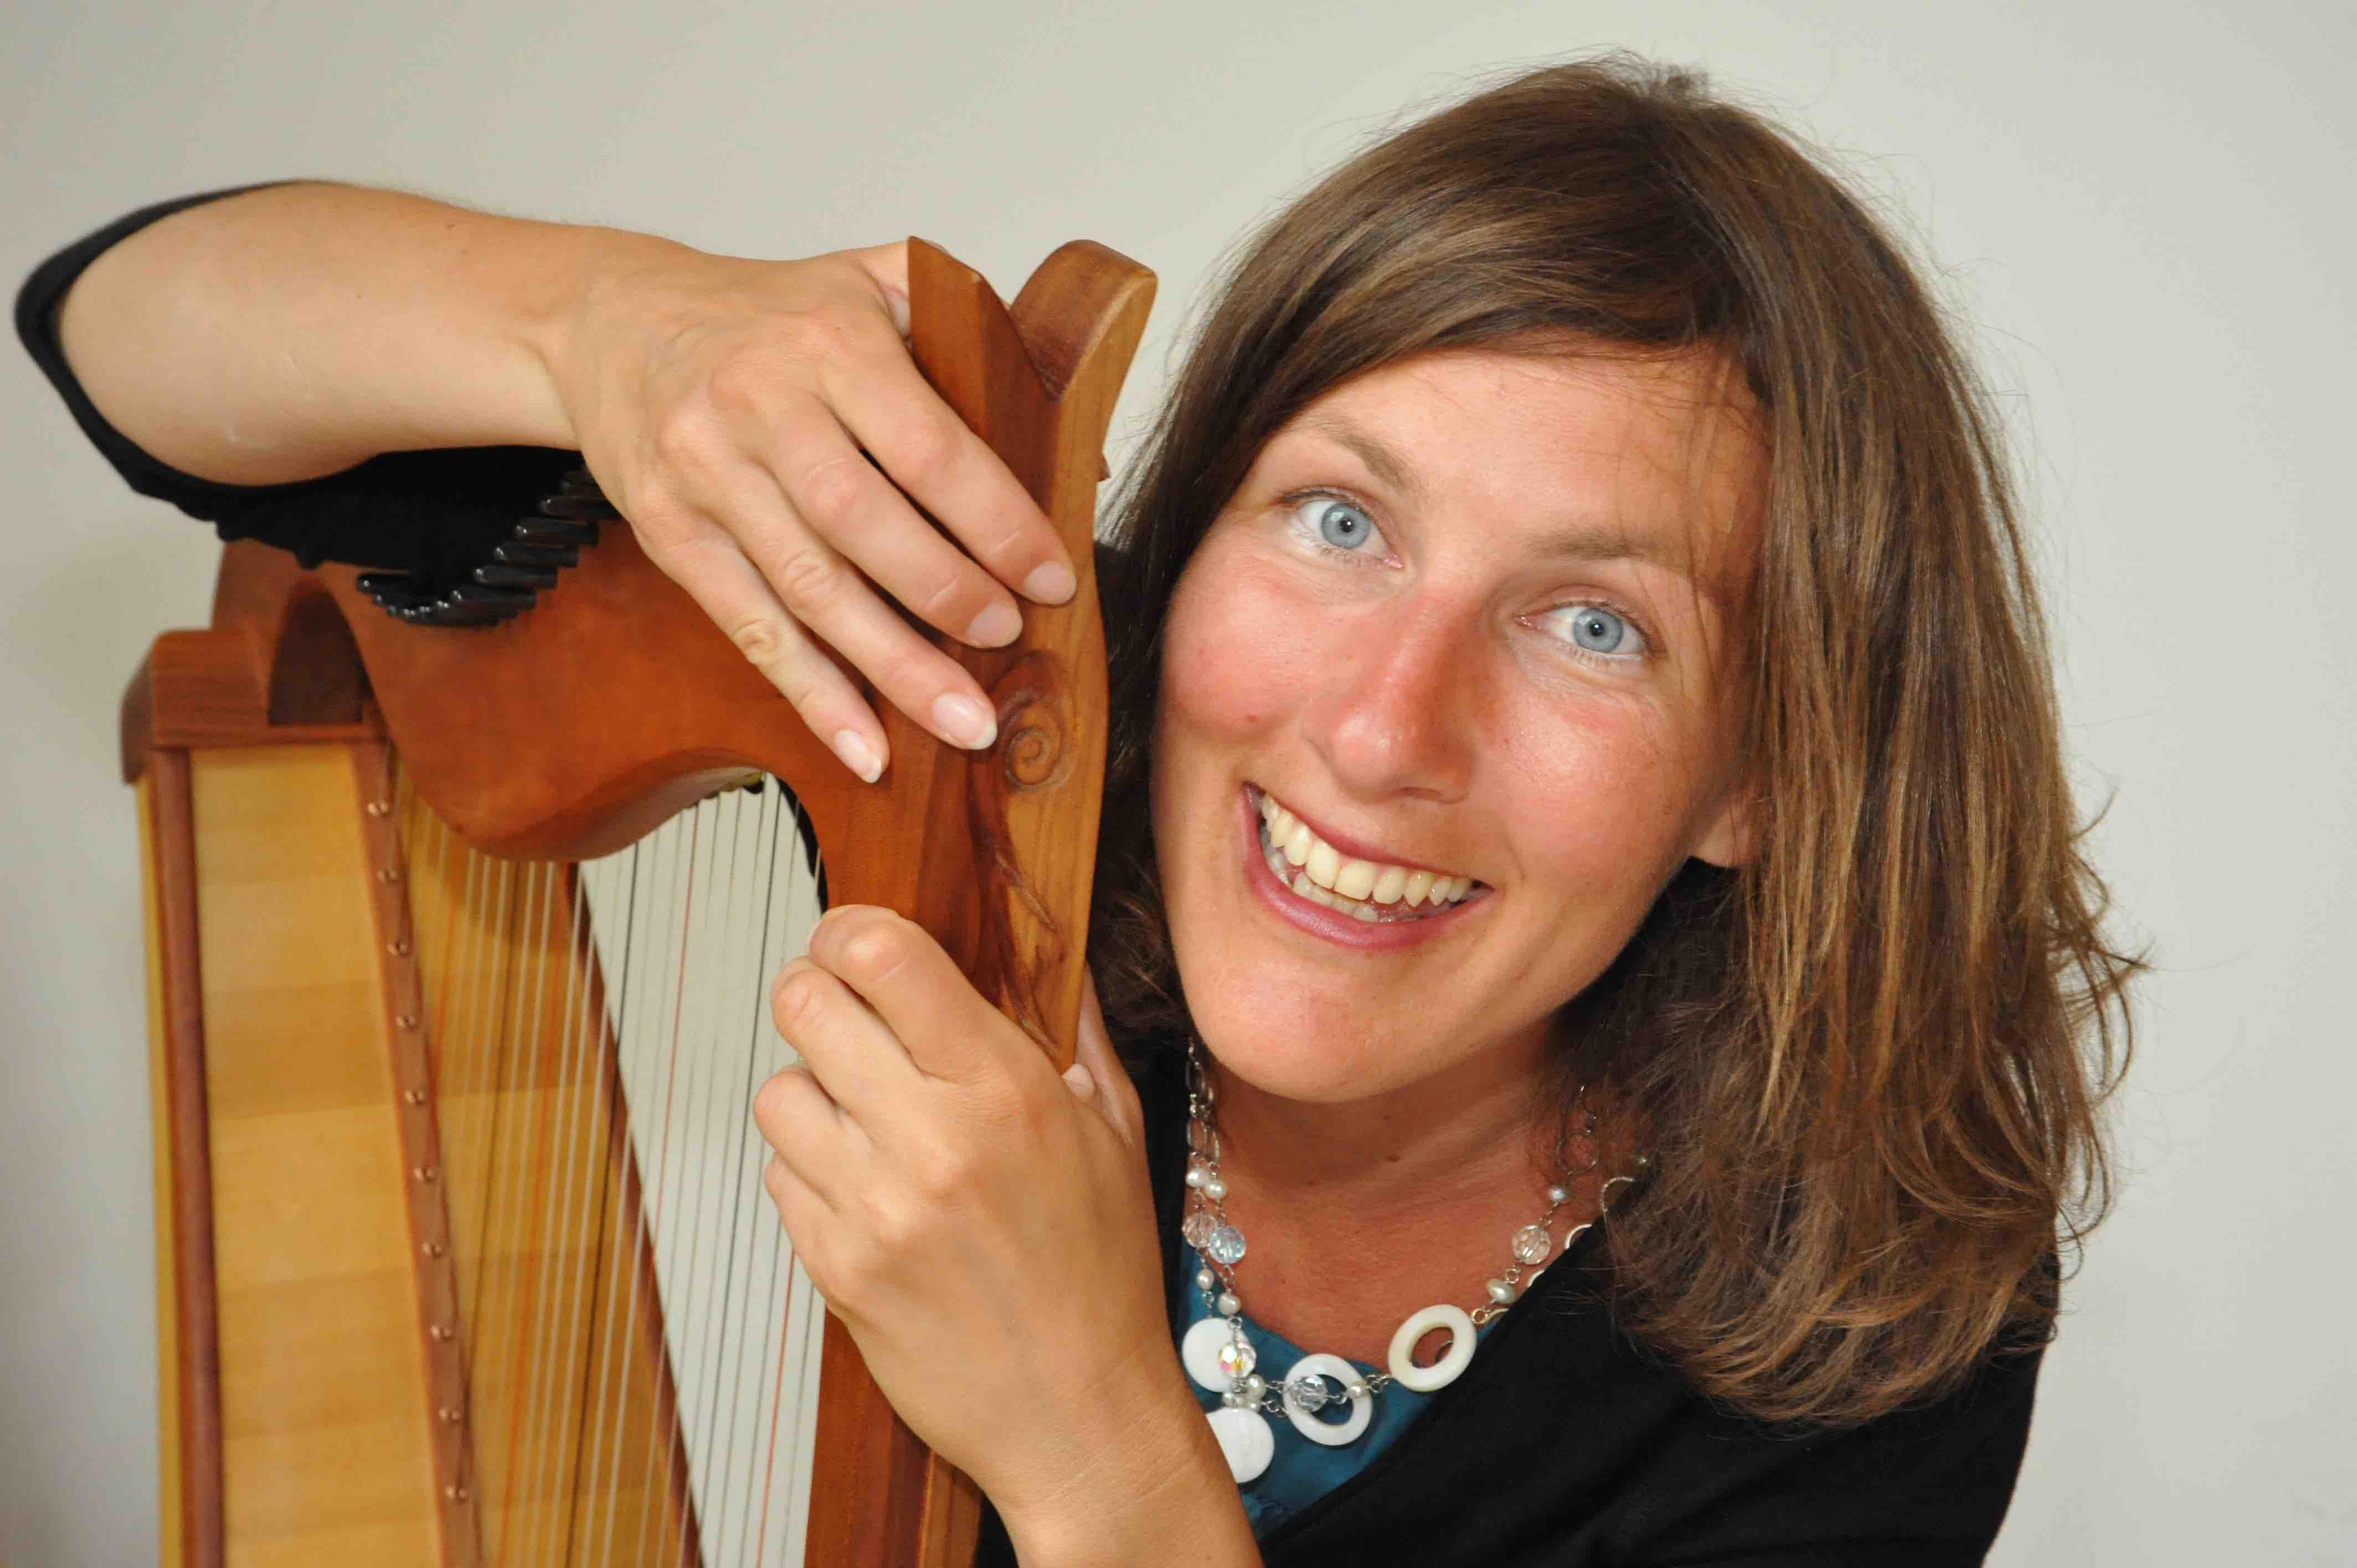 Harfenunterricht landsberg